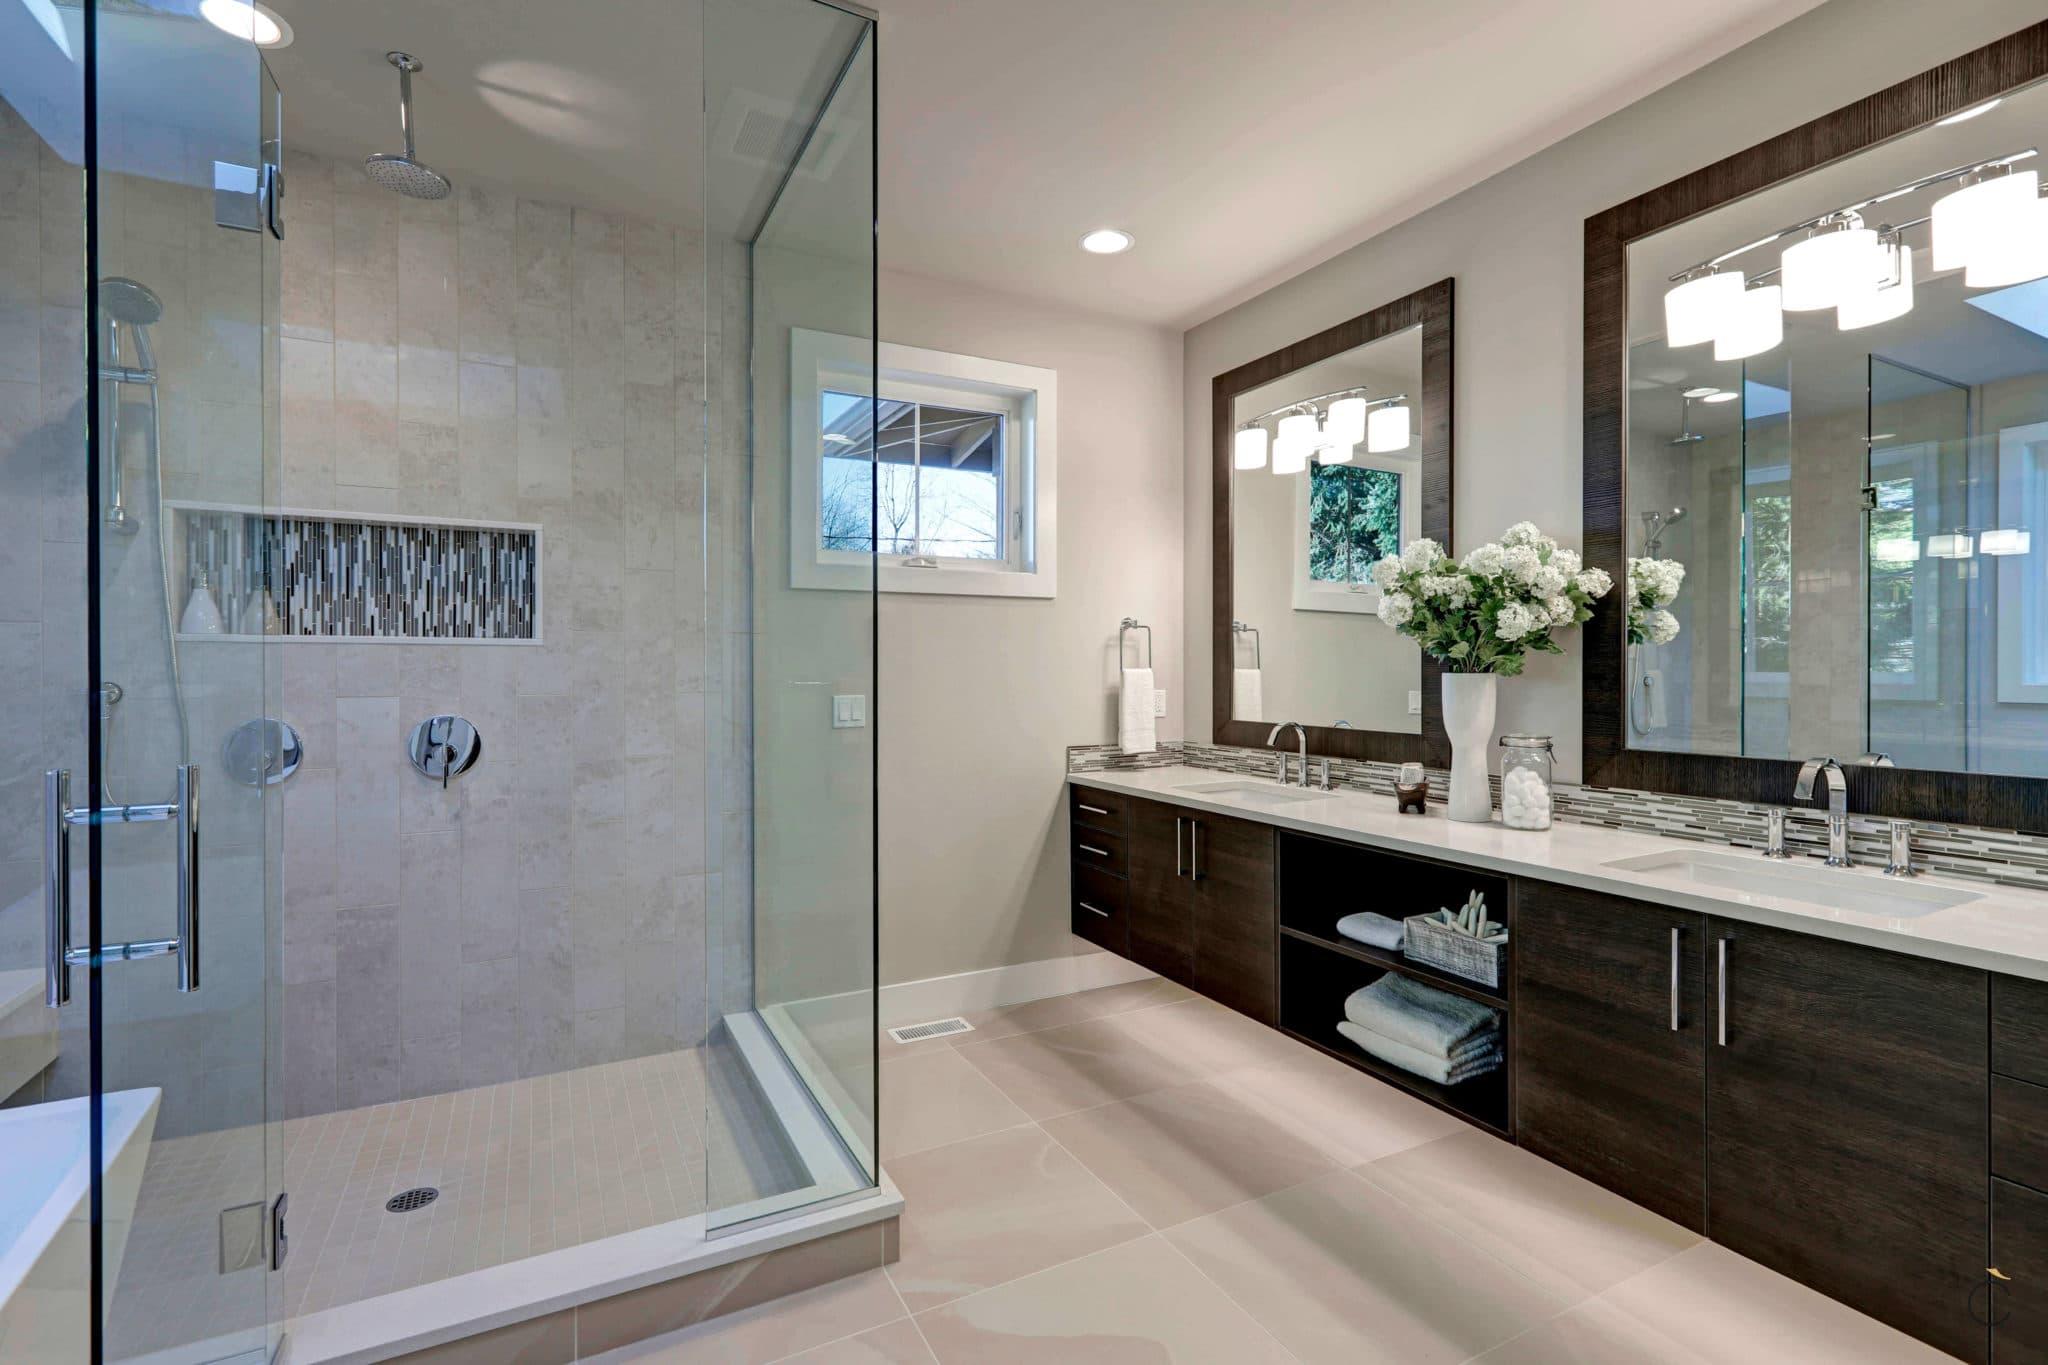 10 consejos para renovar mi baño - Renovar baño